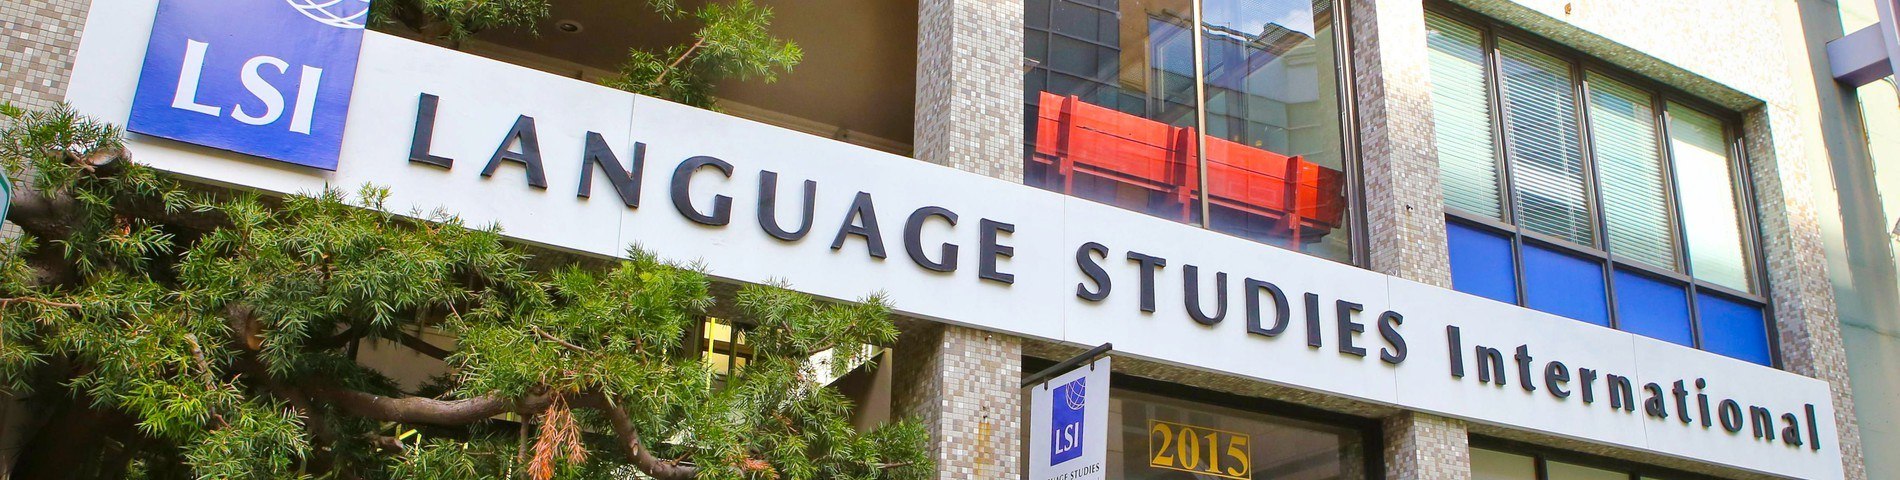 LSI - Language Studies International صورة 1